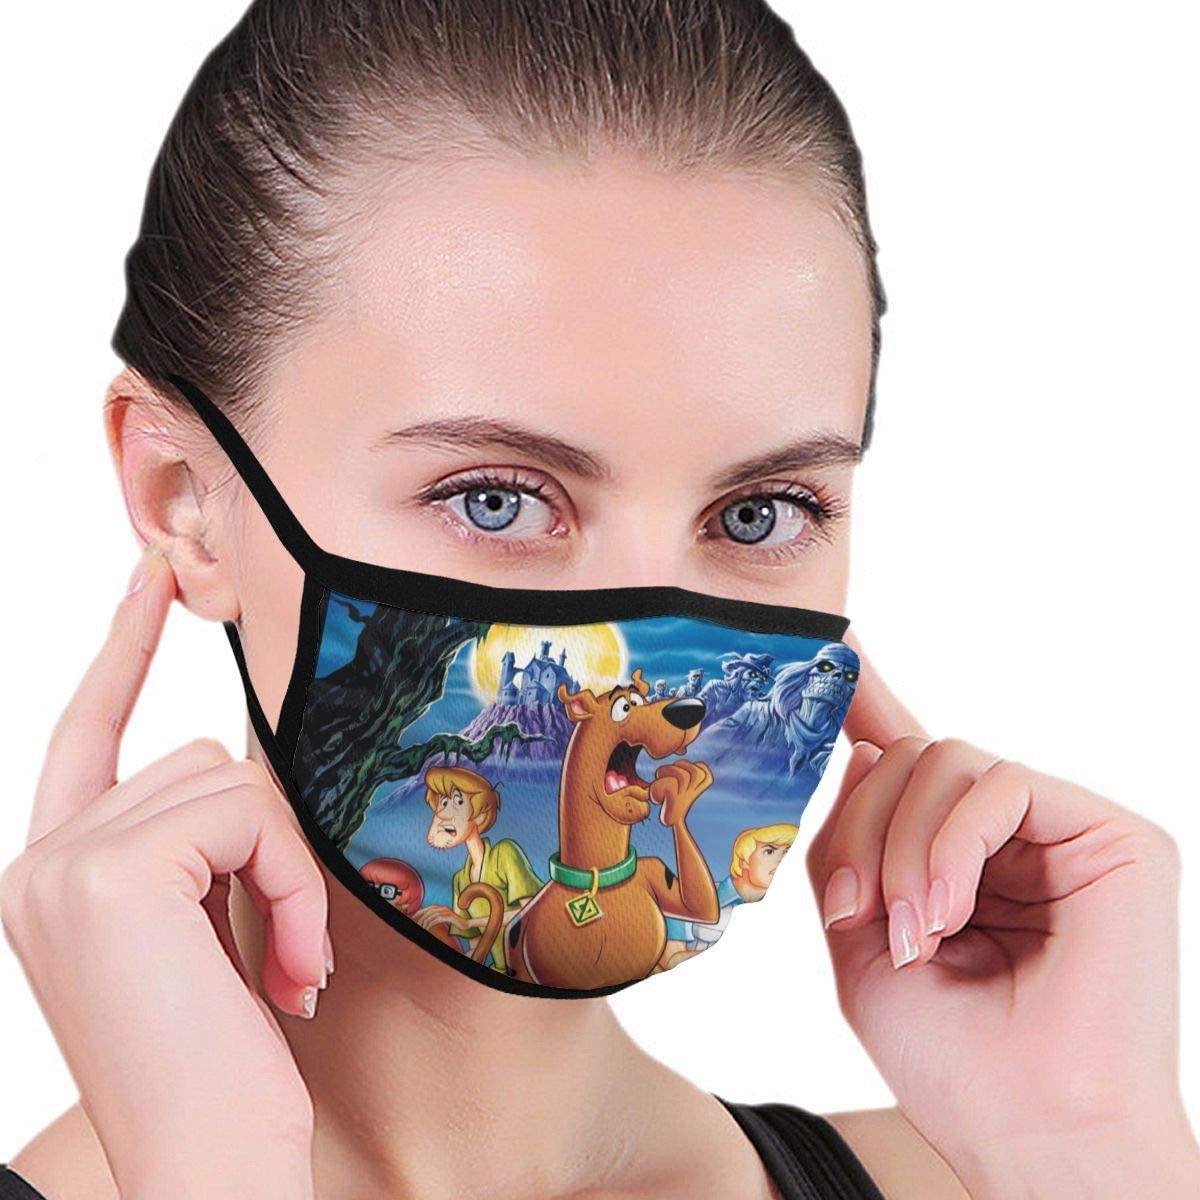 Qwtykeertyi Scooby Doo Fashion Protective Reusable Unisex Black Cotton Washable Balaclava